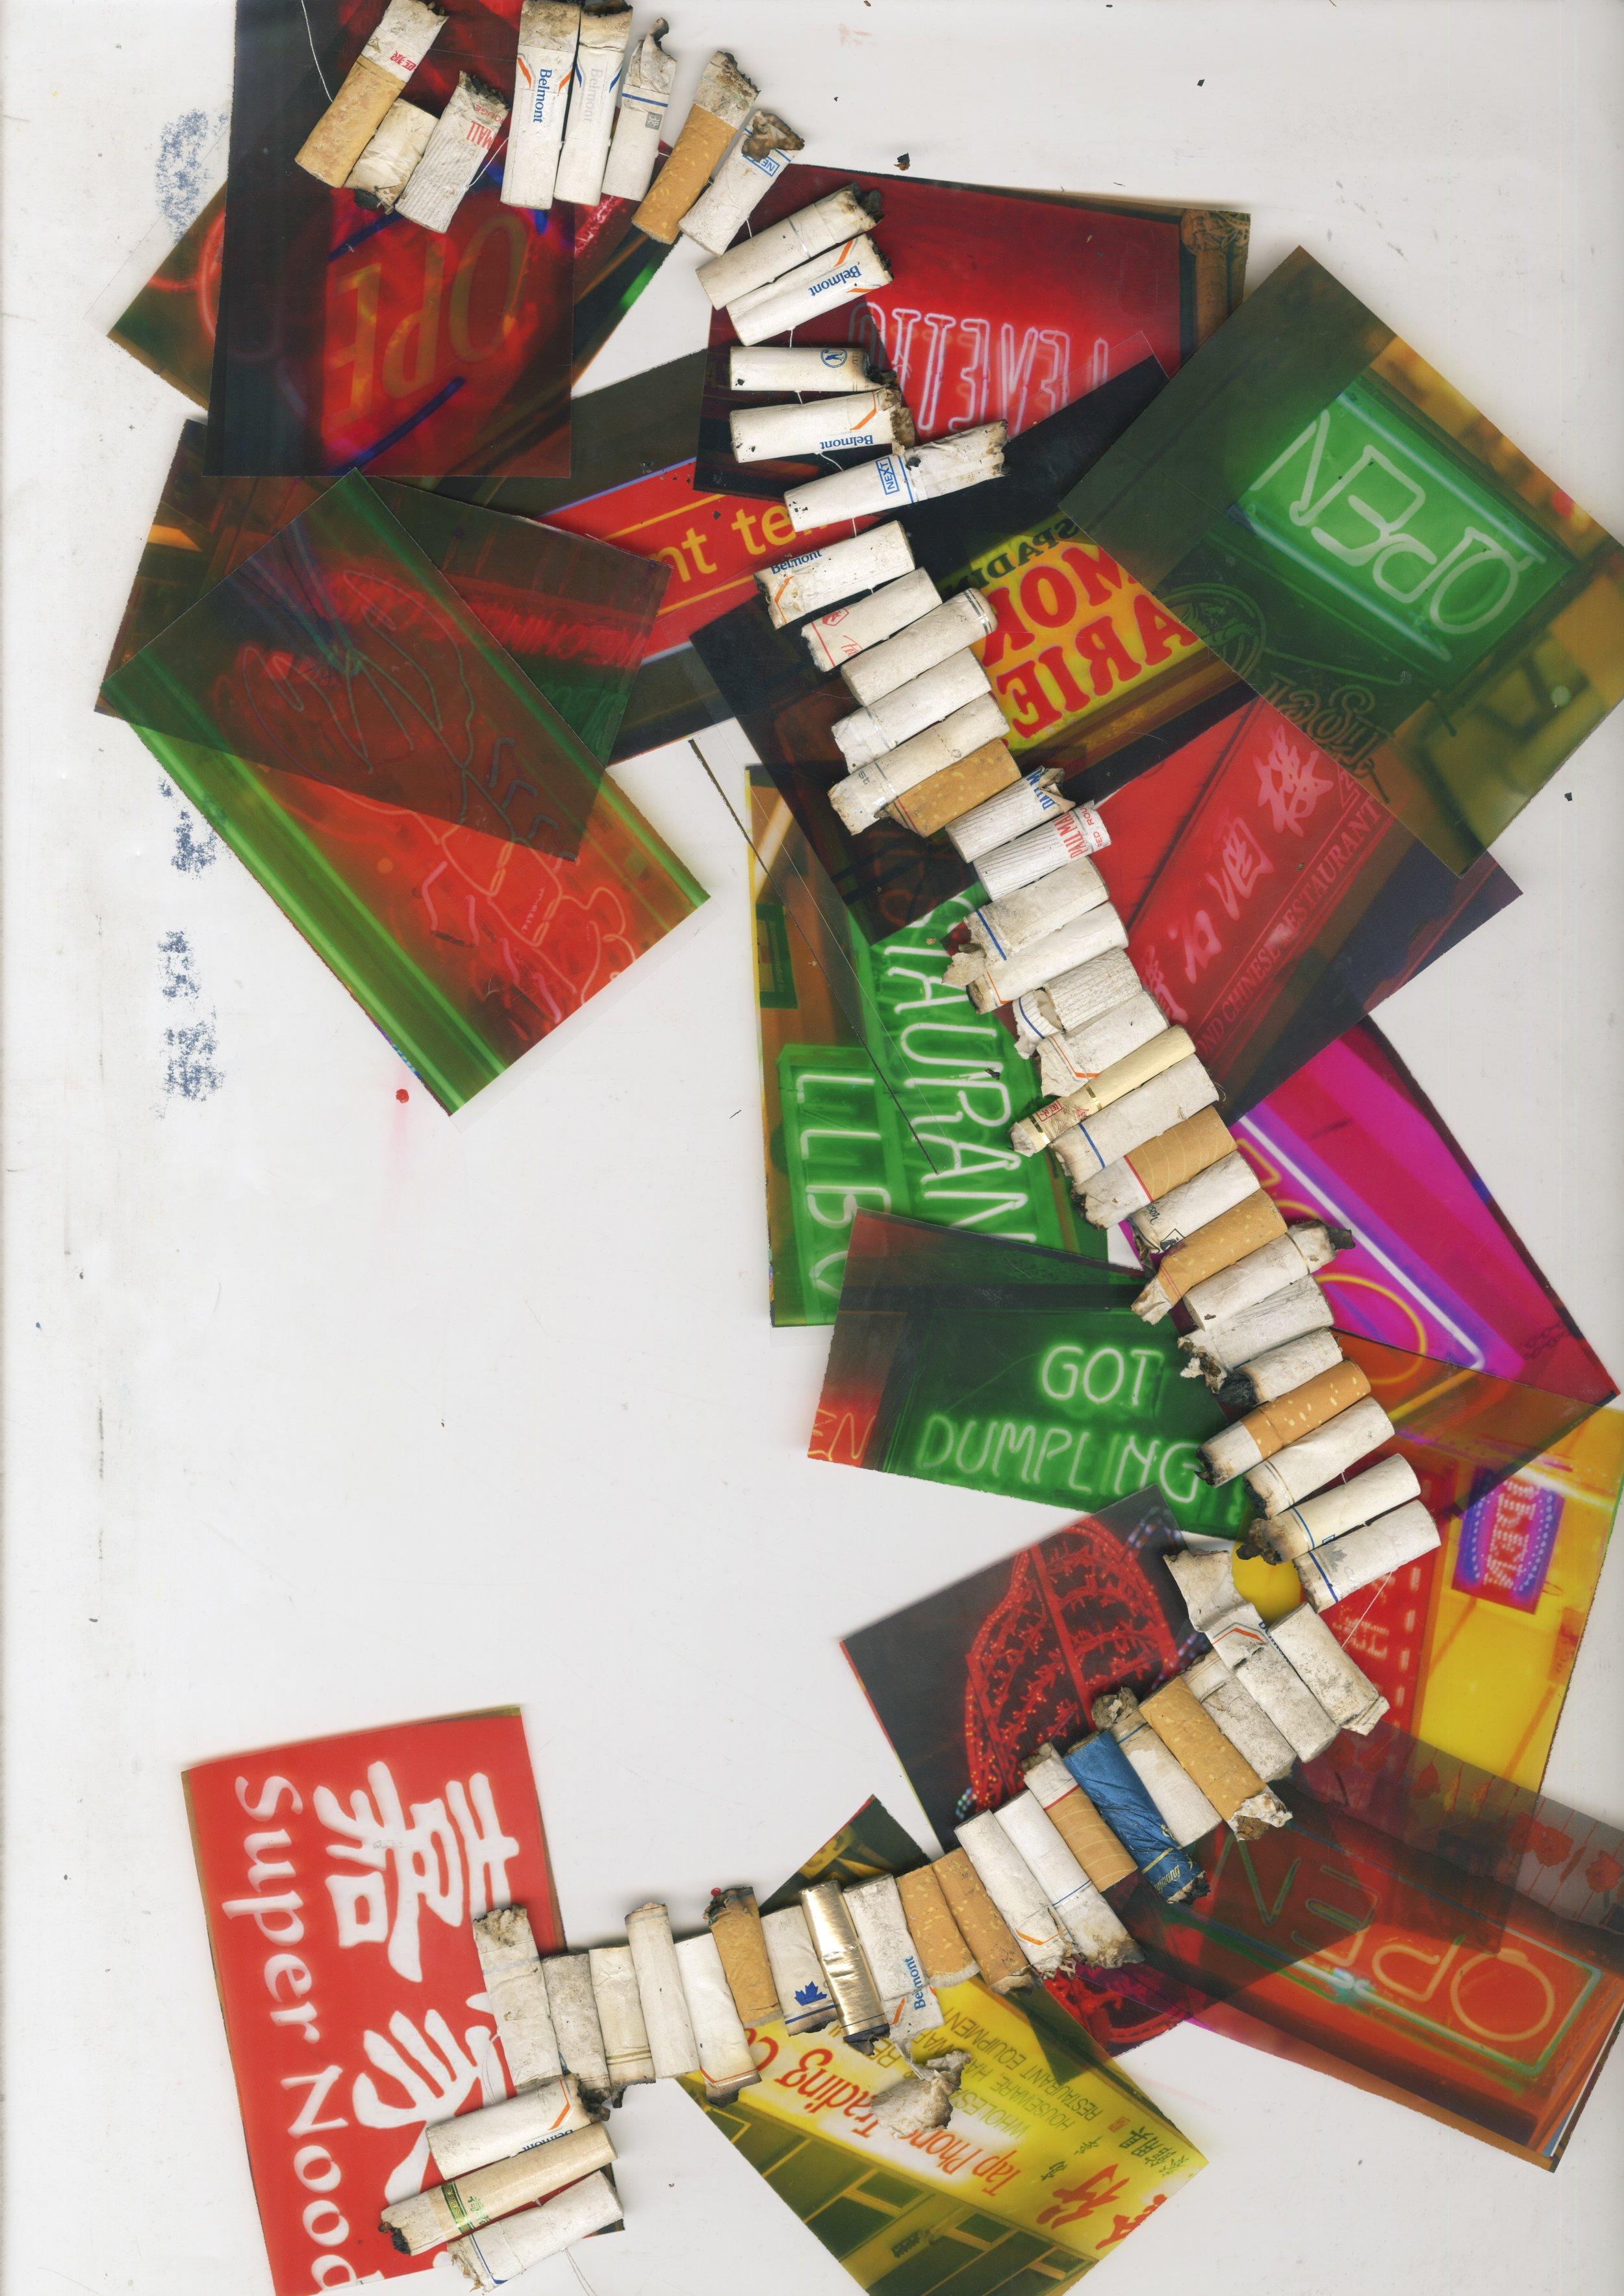 Jan 23rd chinatown scans 3.jpeg